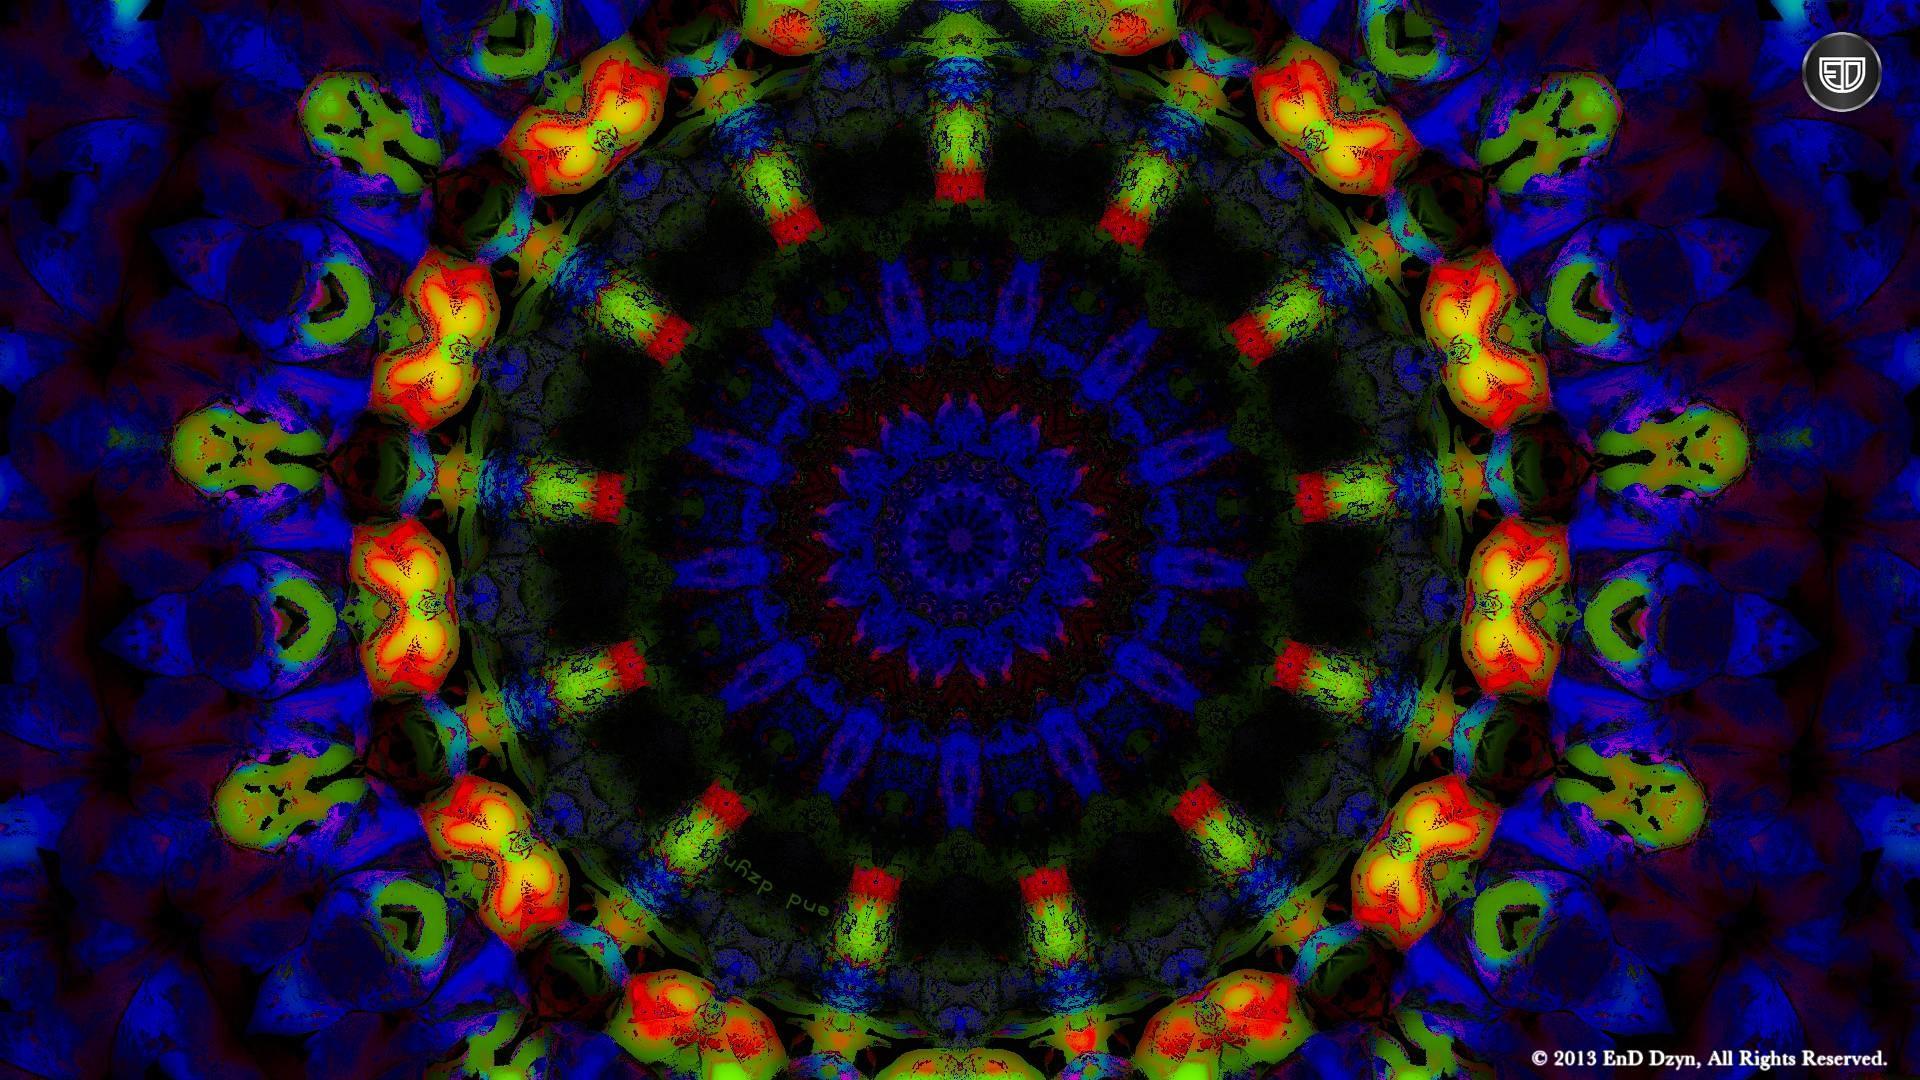 Psychedelic HD Background Wallpaper – Blue Orange Trippy 3D .